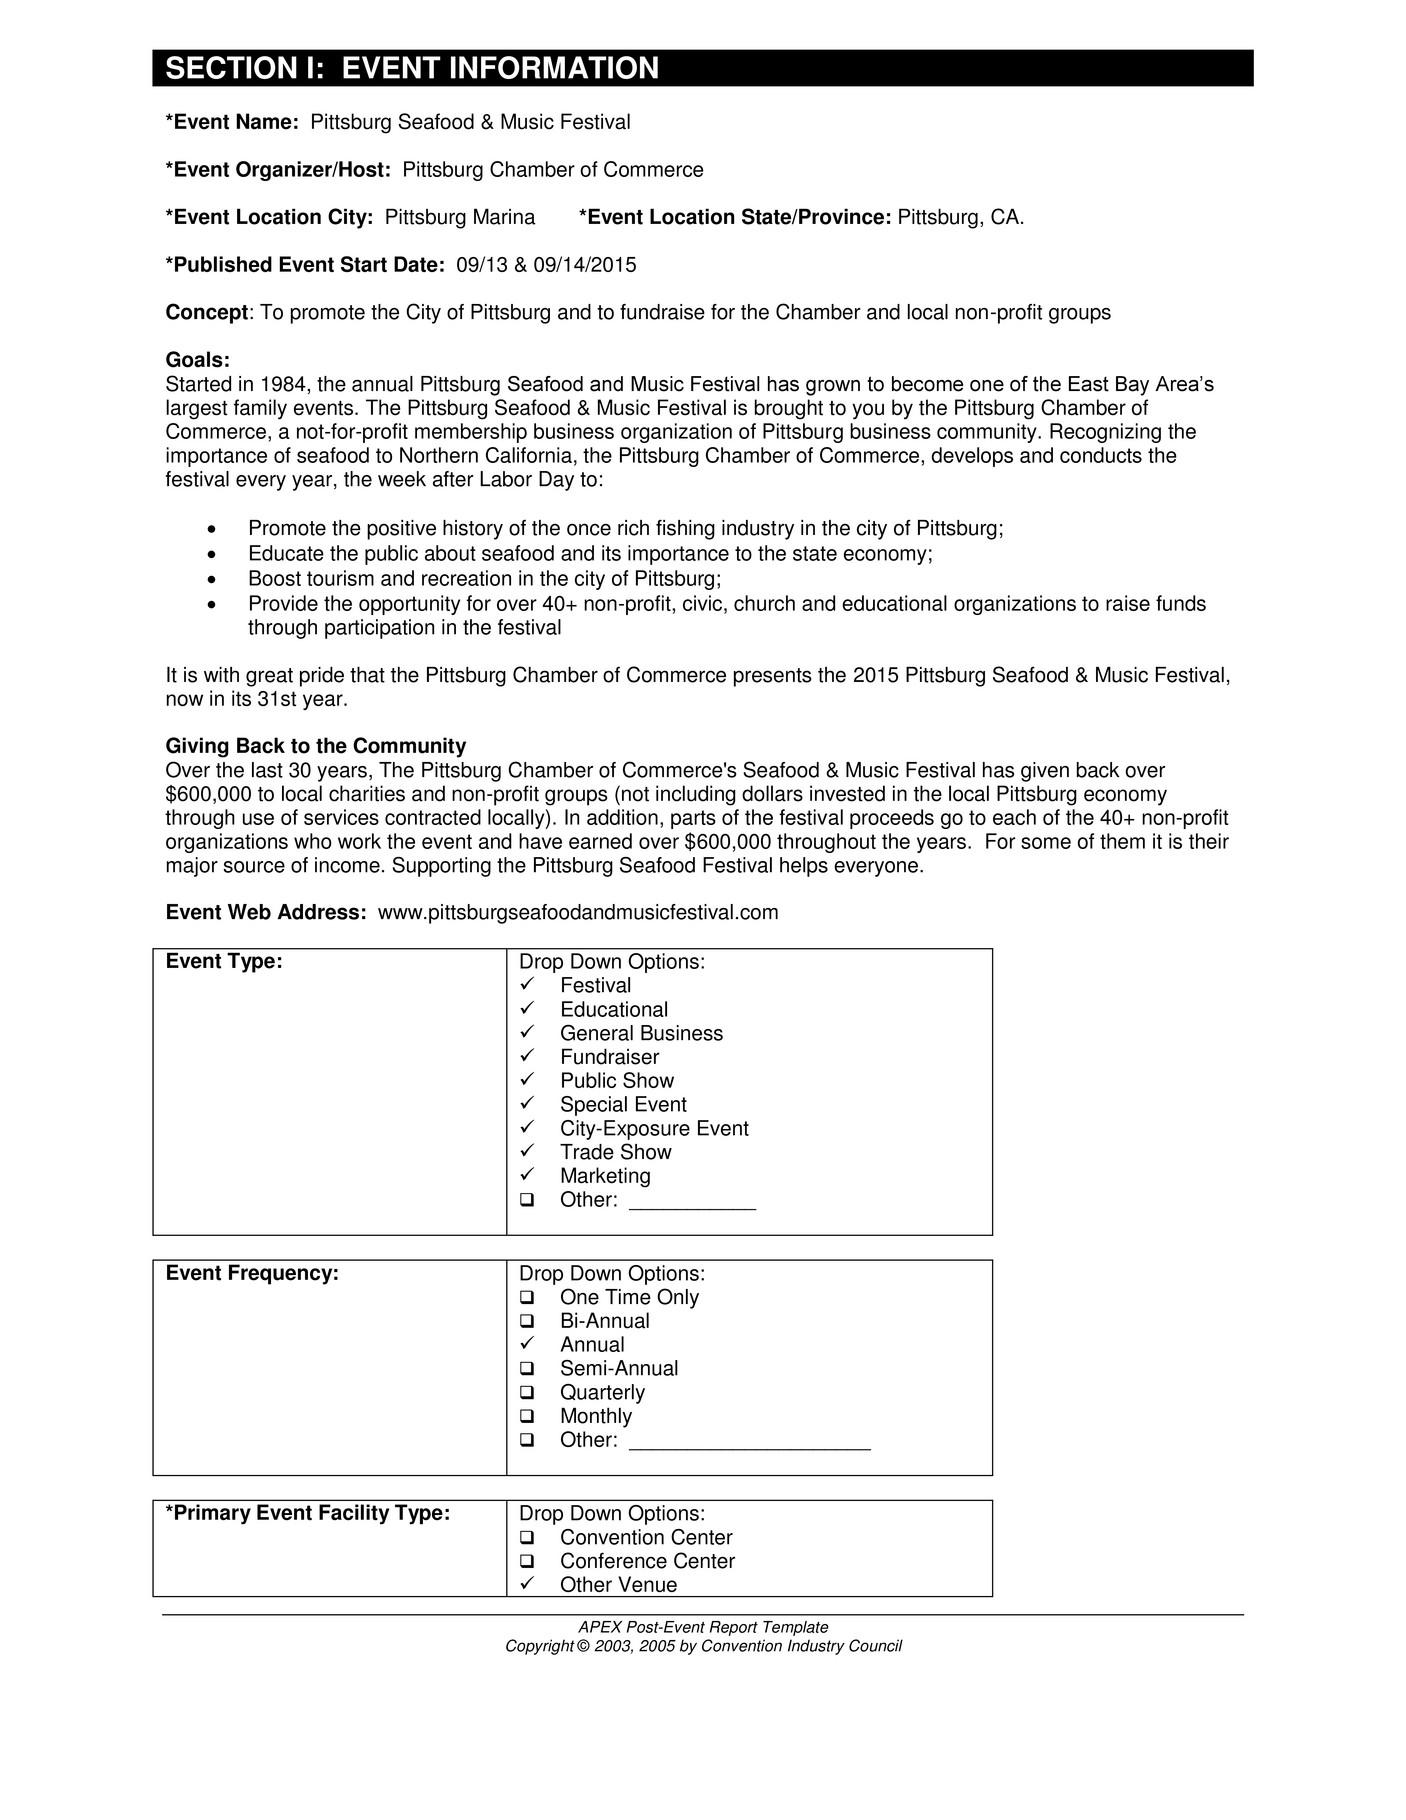 10 Executive Summary Templates  Free Word